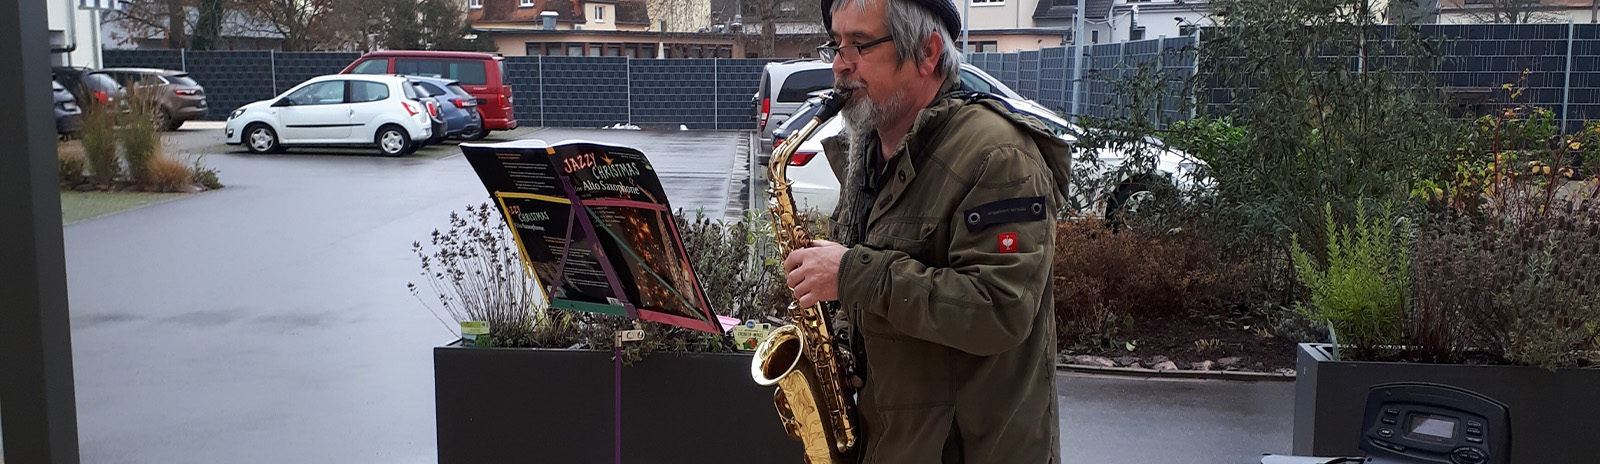 Haus_FLJ_Konzert_slider